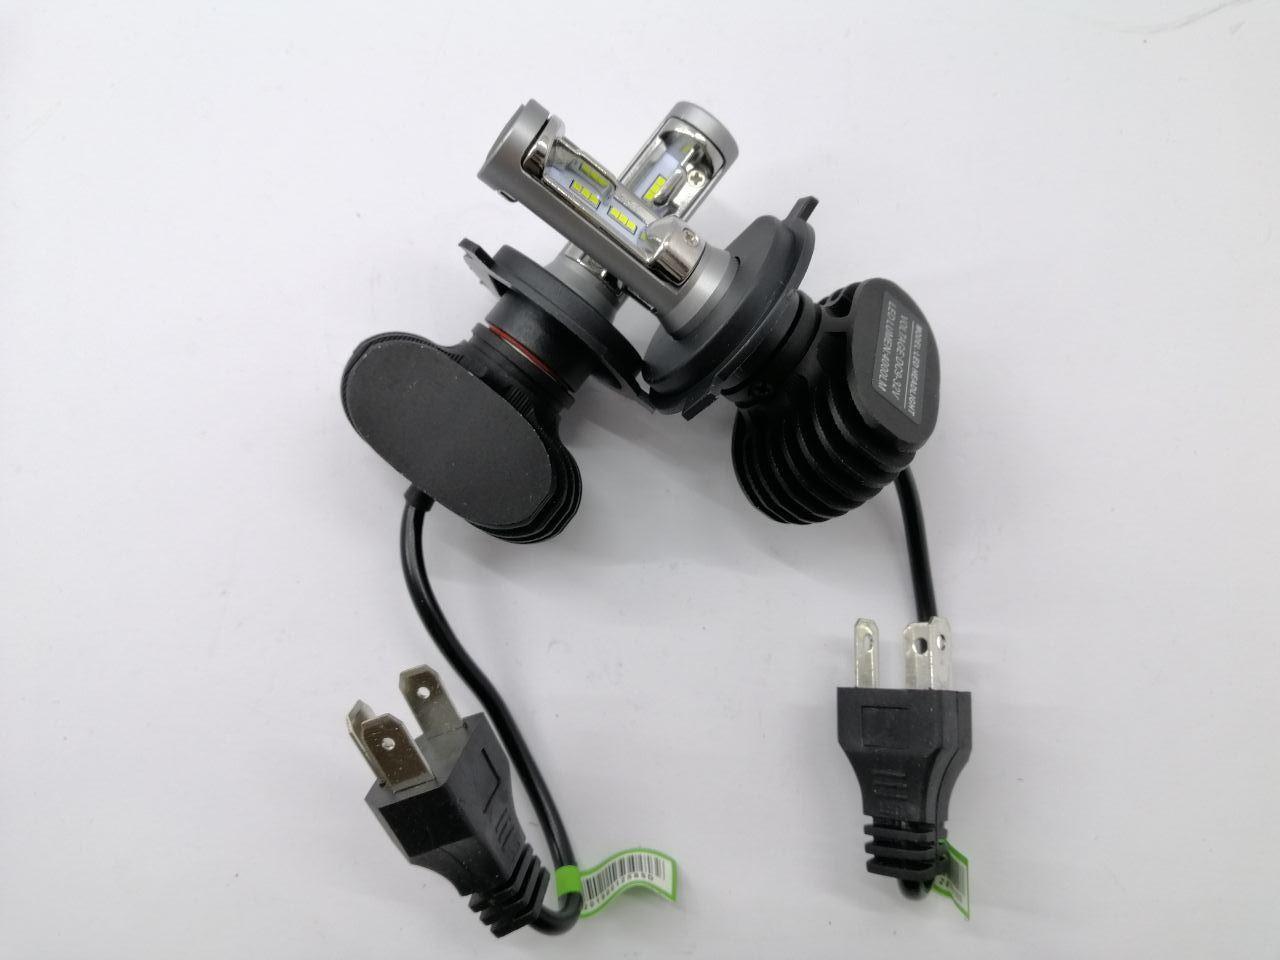 Лампа LED H4 12/24V диод радиатор 6500К, S1 (пр-во Китай)